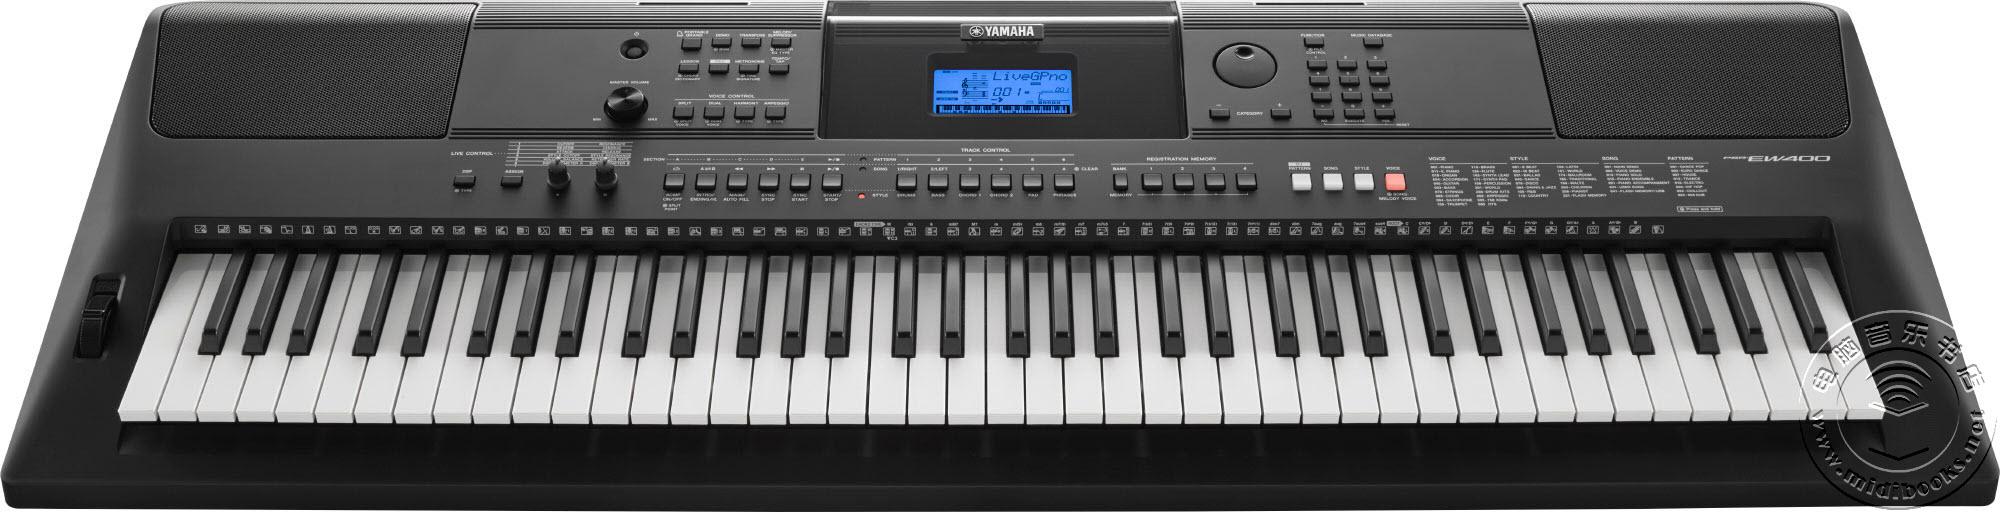 [SNAMM2016] YAMAHA 发布 PSR-E453 和 PSR-EW400 便携式键盘